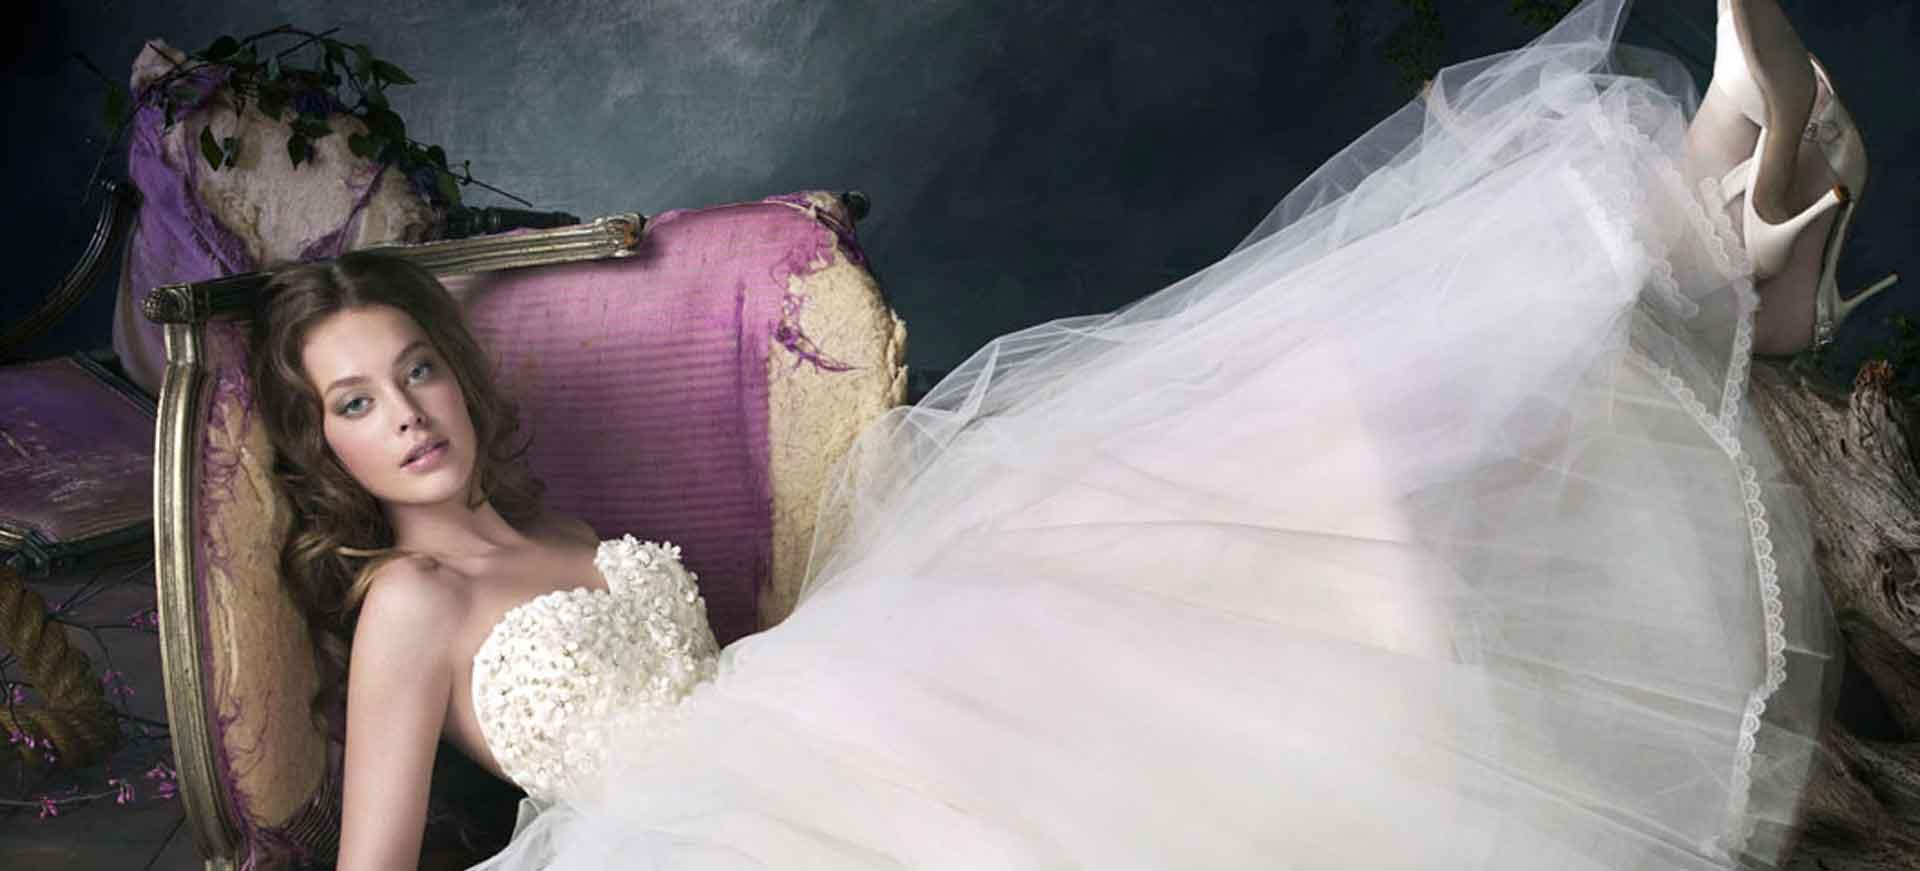 Custom-Tulle-Wedding-Garters-Bridal-Garters-Prom-Garters-Linda-Joyce-Couture-Girly-Girl-Garters